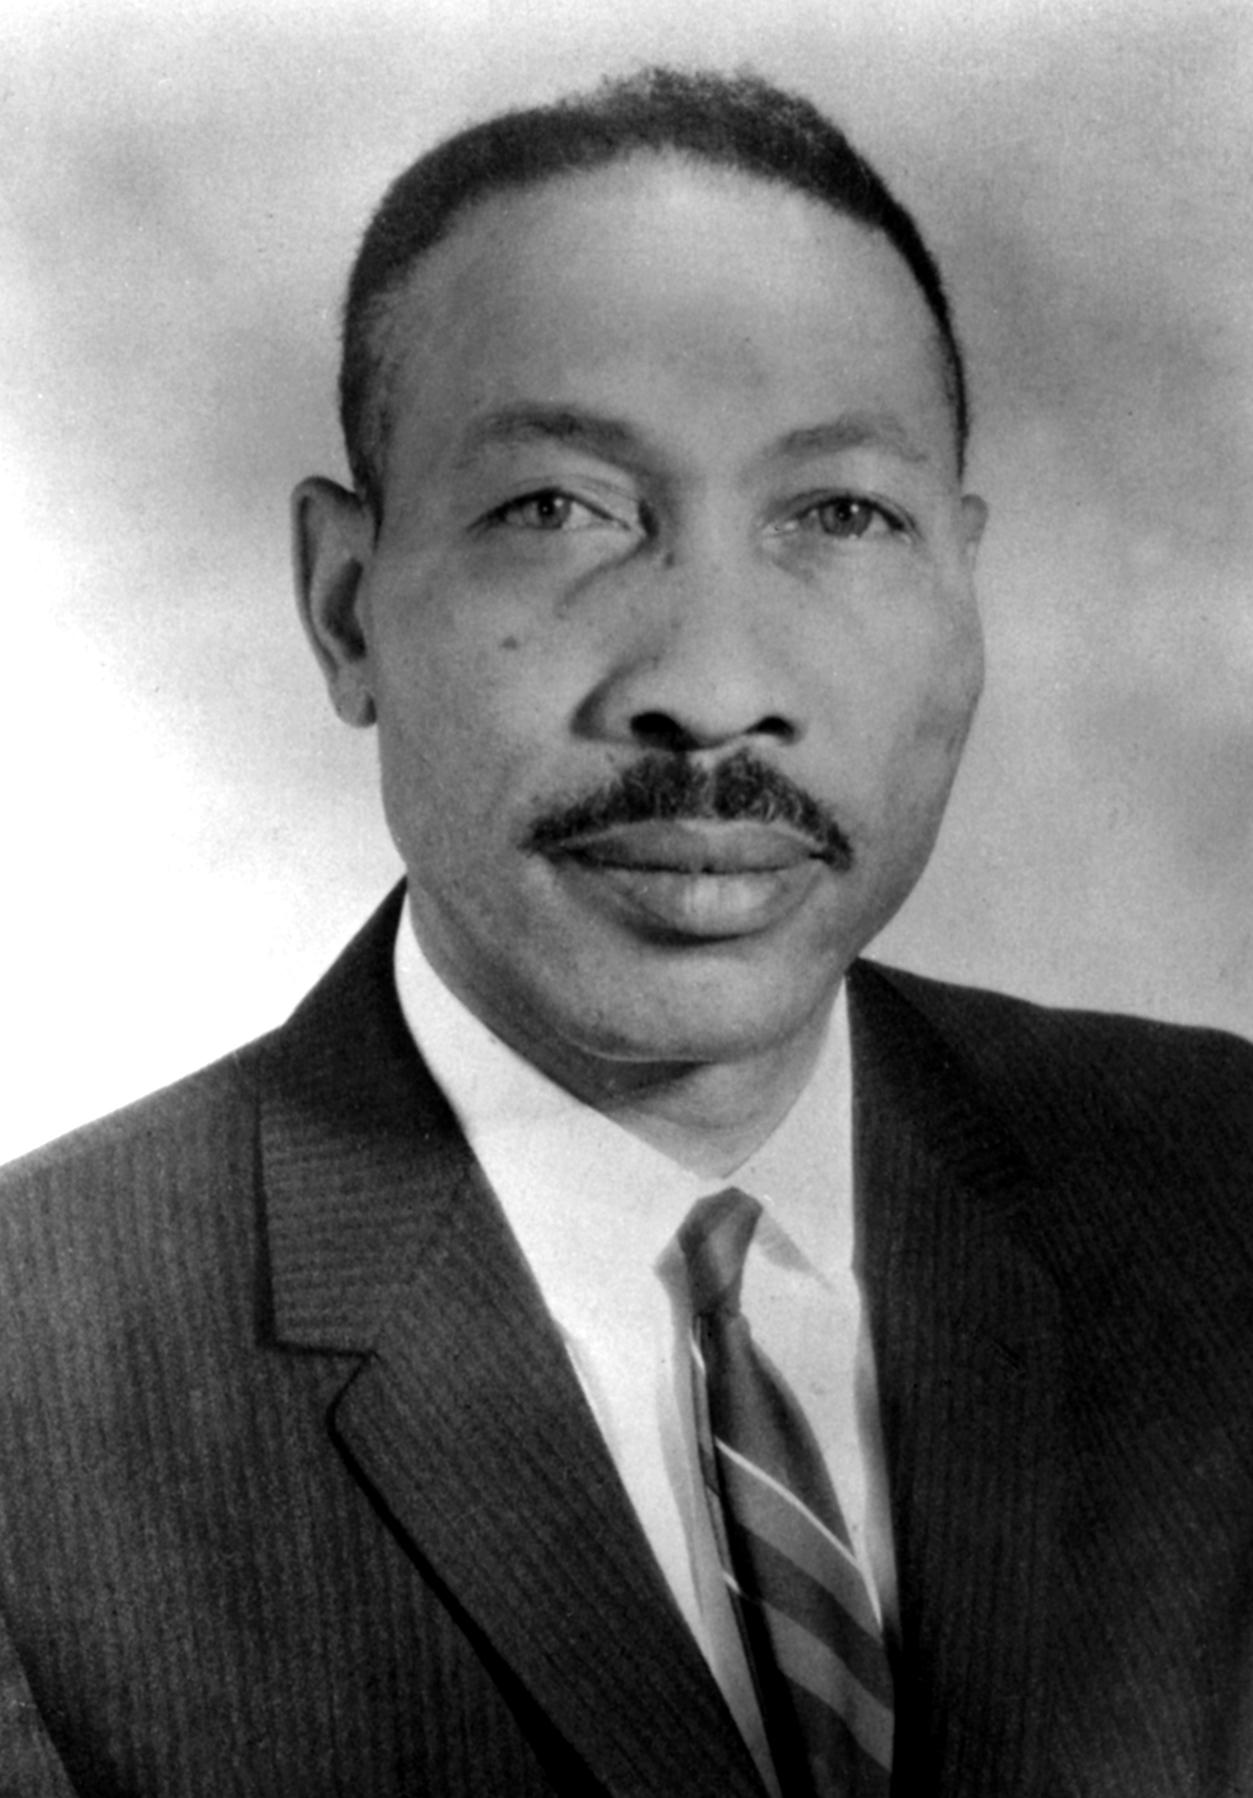 Harold Bragg